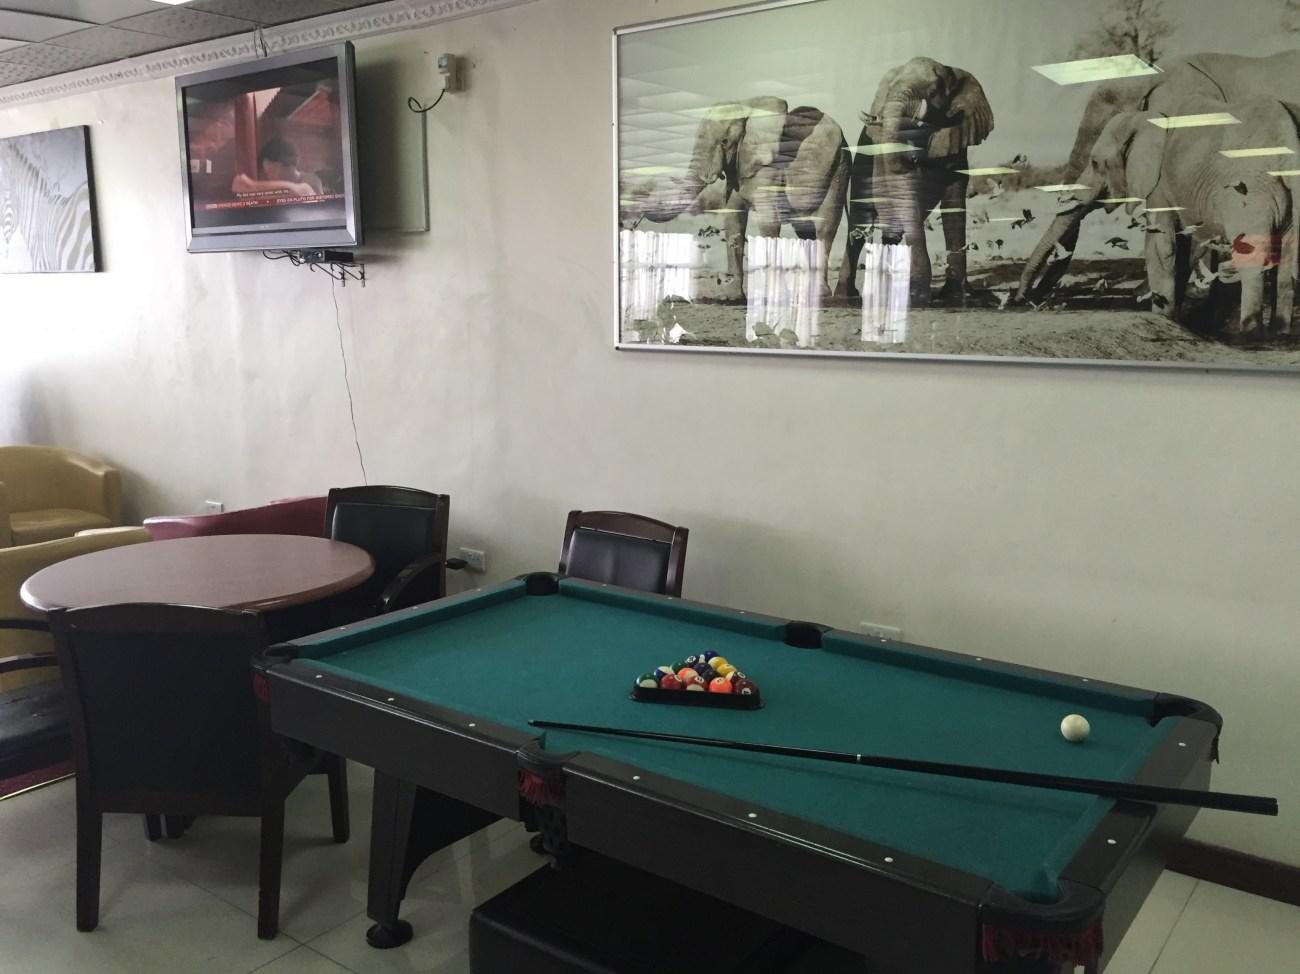 Tanzania Lounge Dar Es Salaam - 06